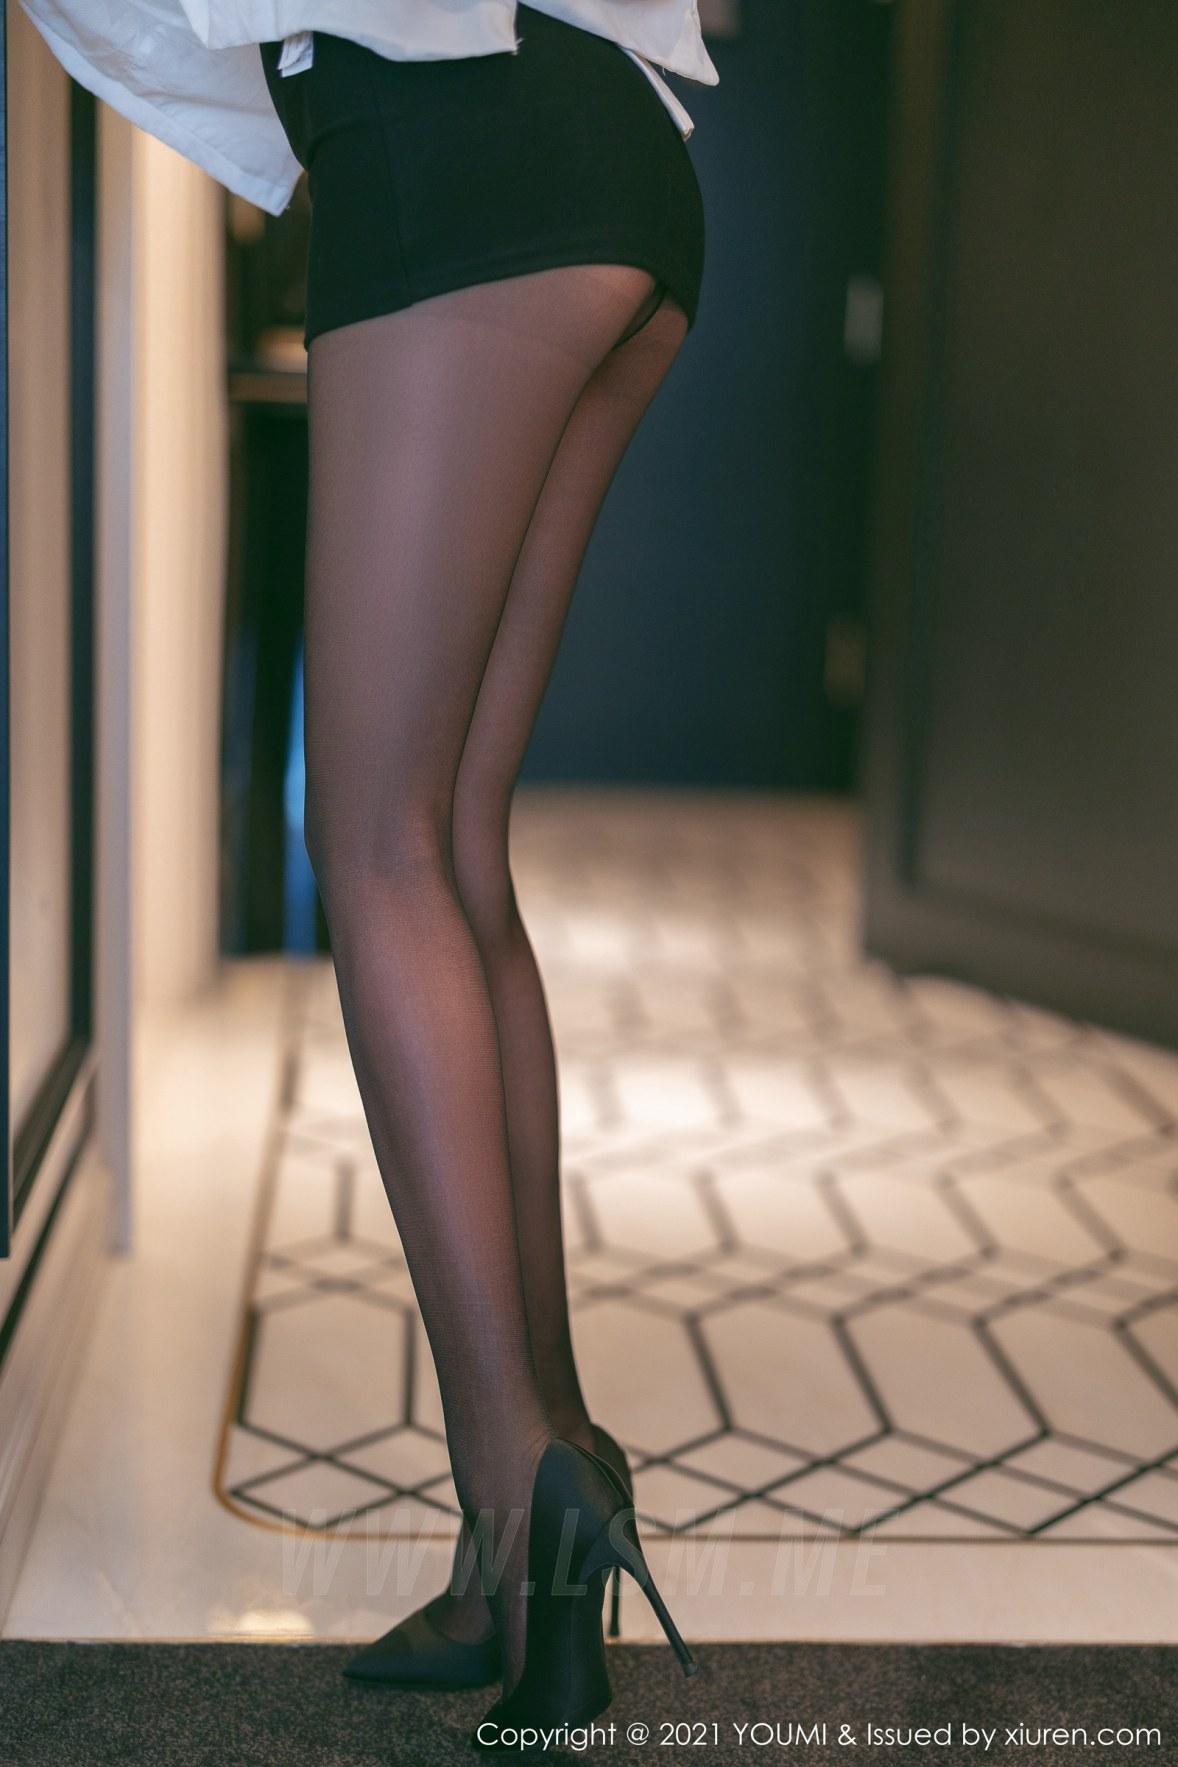 648 007 8c5 3600 5400 - YOUMI 尤蜜荟 Vol.648  镂空服饰 Emily顾奈奈 澳门旅拍 - 尤蜜荟 -【免费在线写真】【丽人丝语】